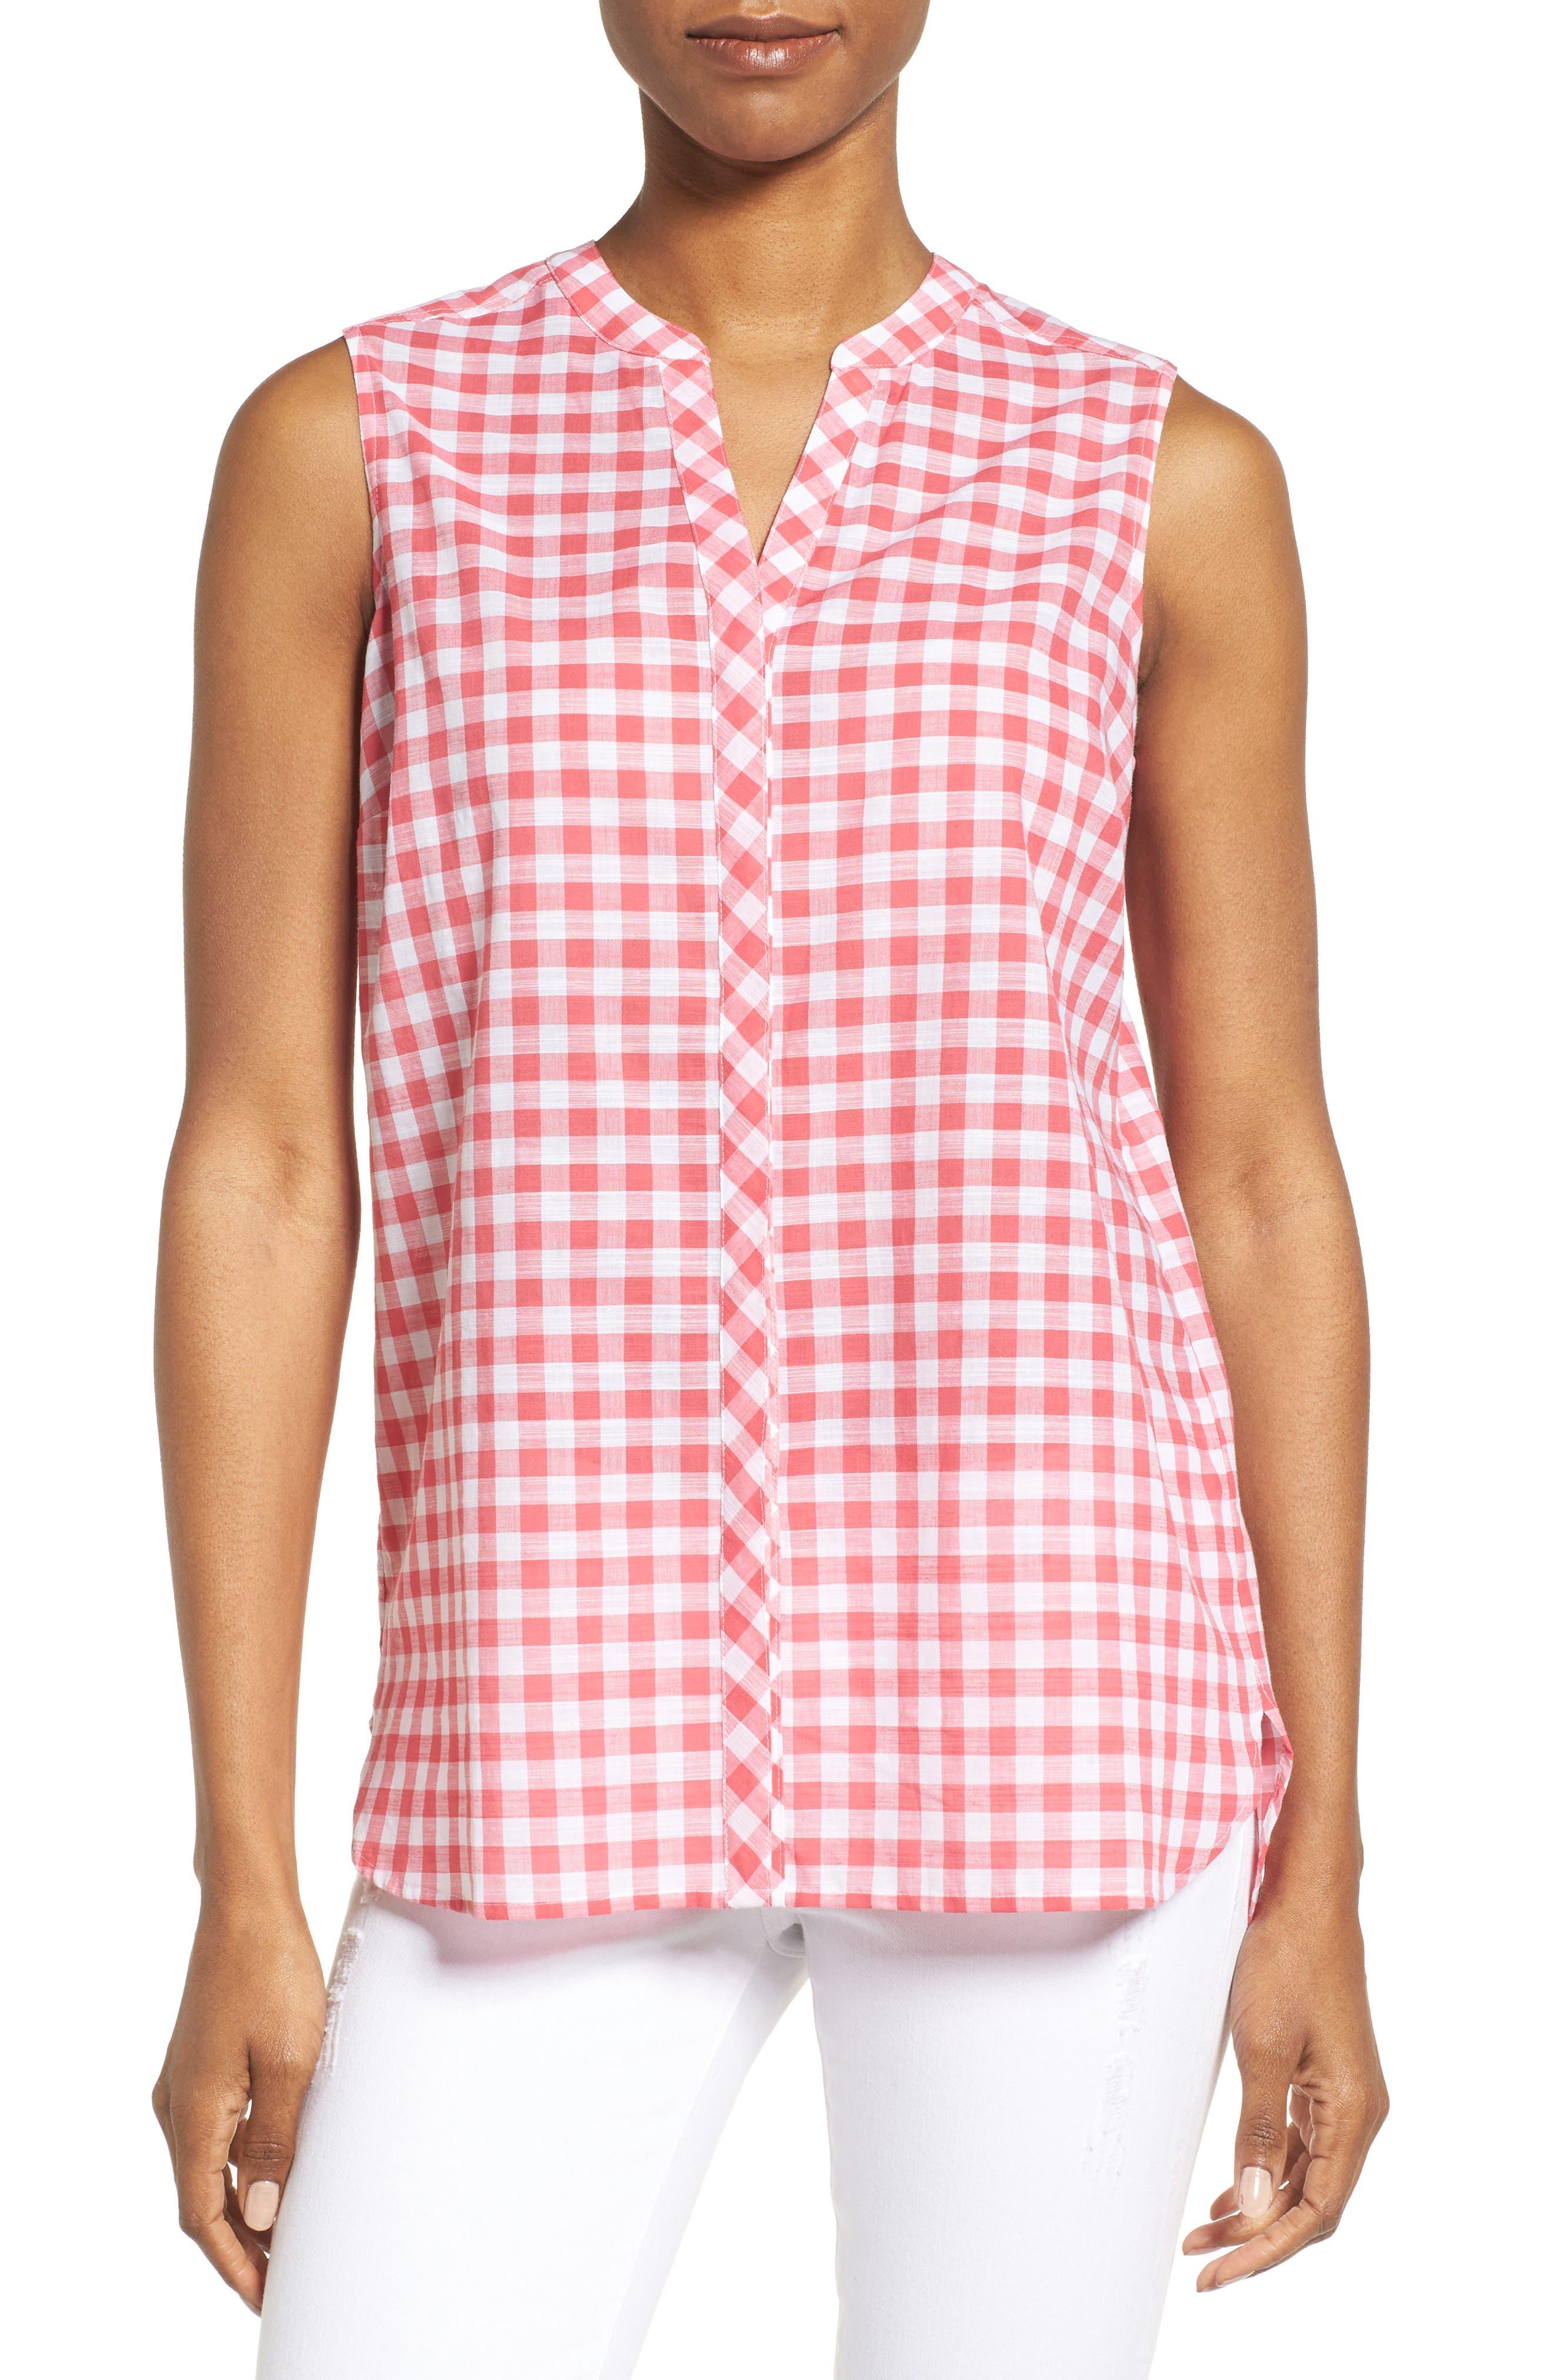 Alternate Image 1 Selected - Foxcroft Gingham Sleeveless Shirt (Regular & Petites)